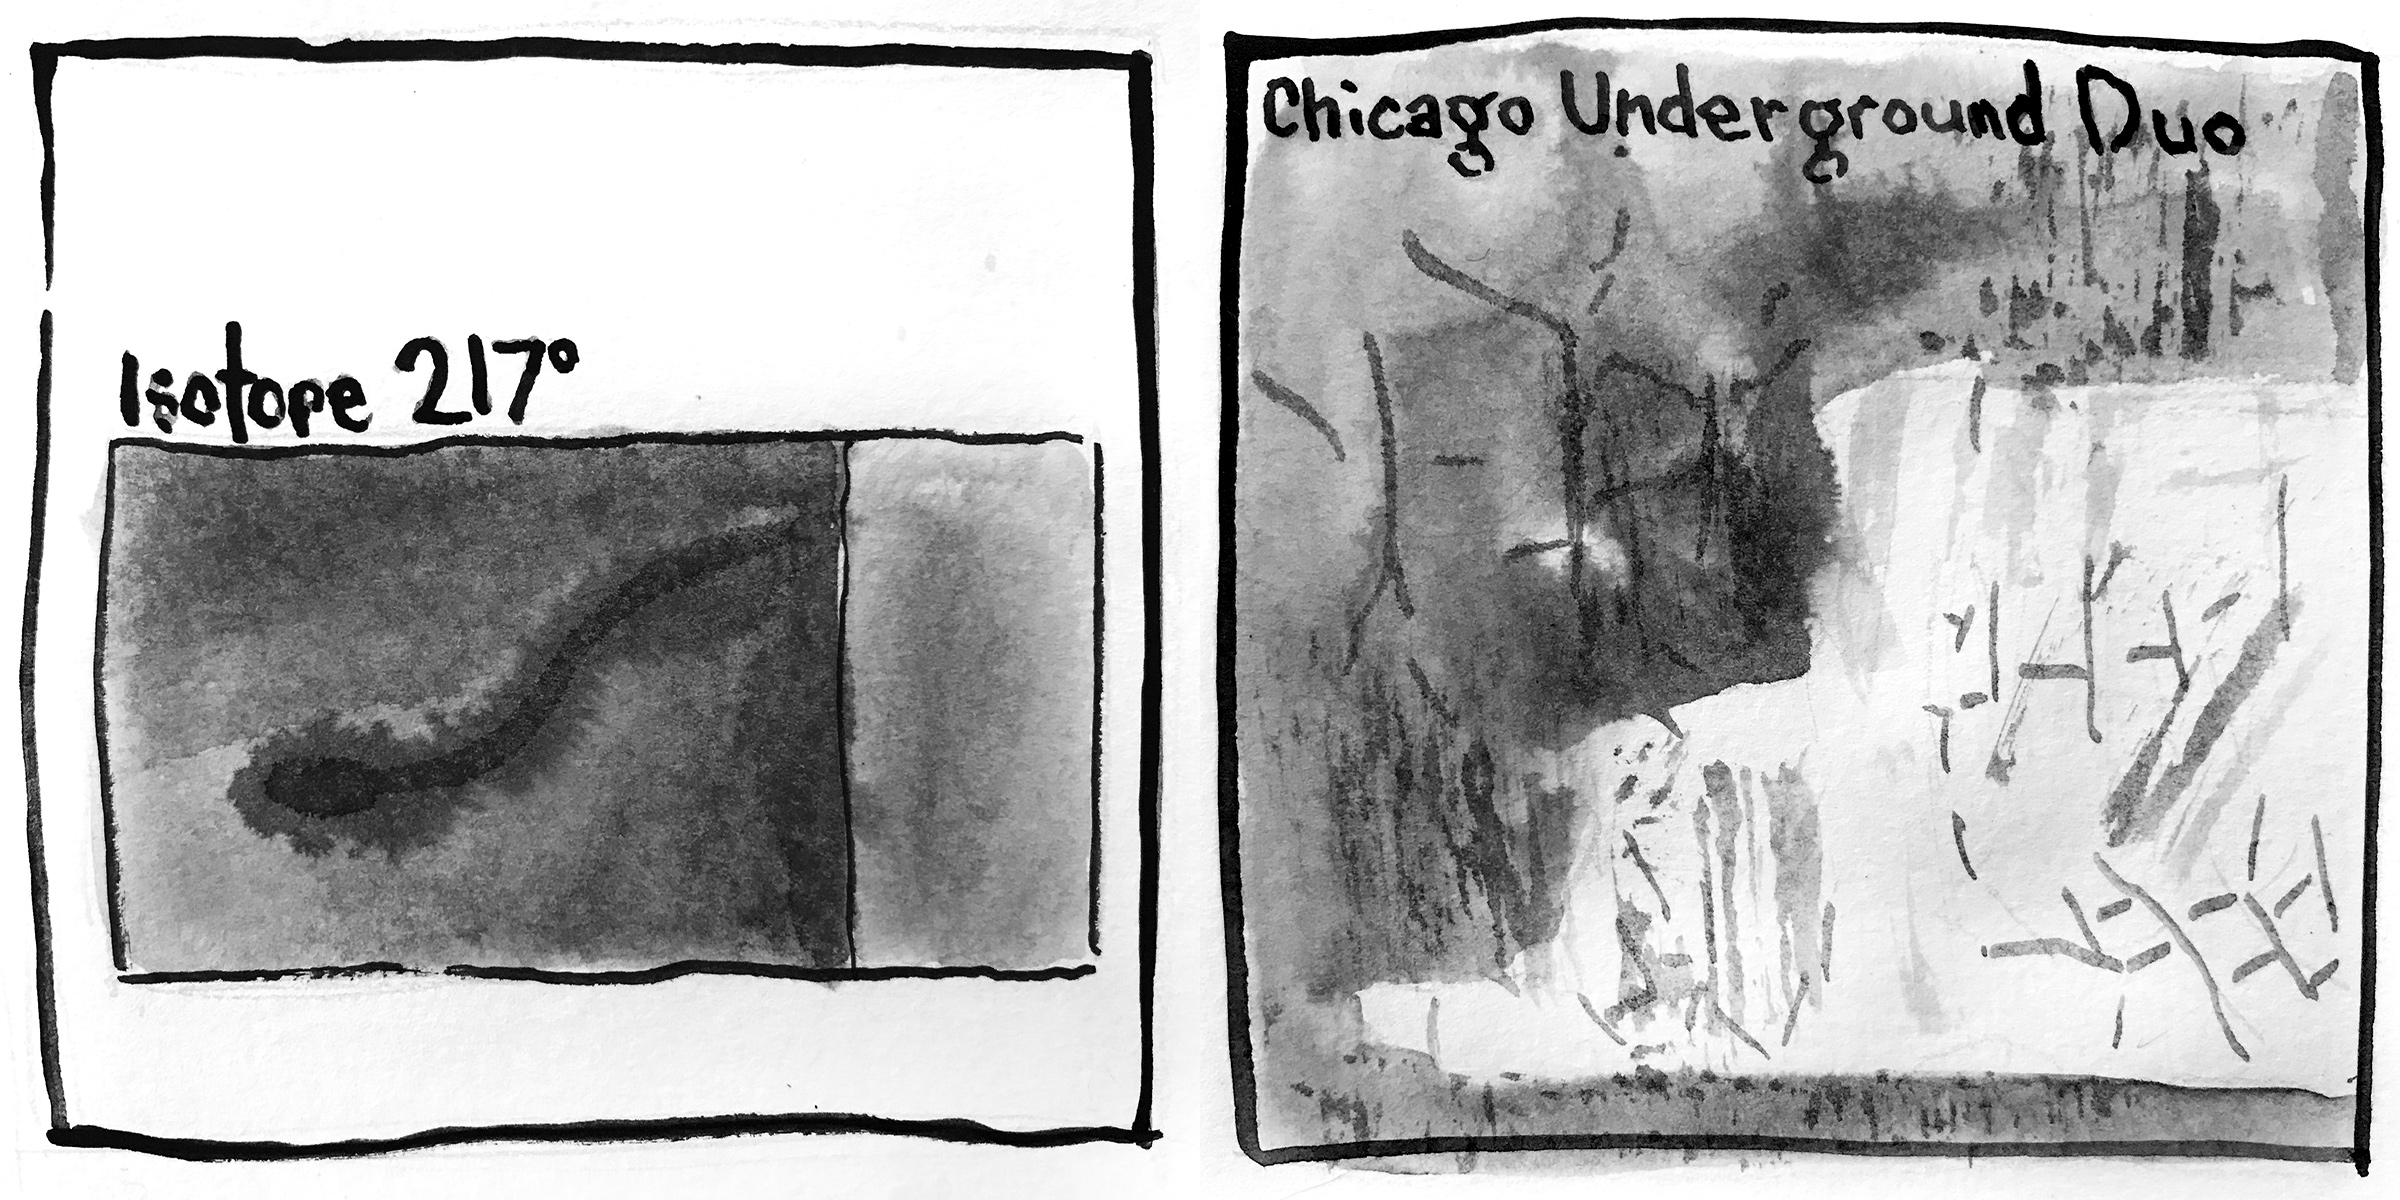 Isotope 217 _ Chicago Underground Duo